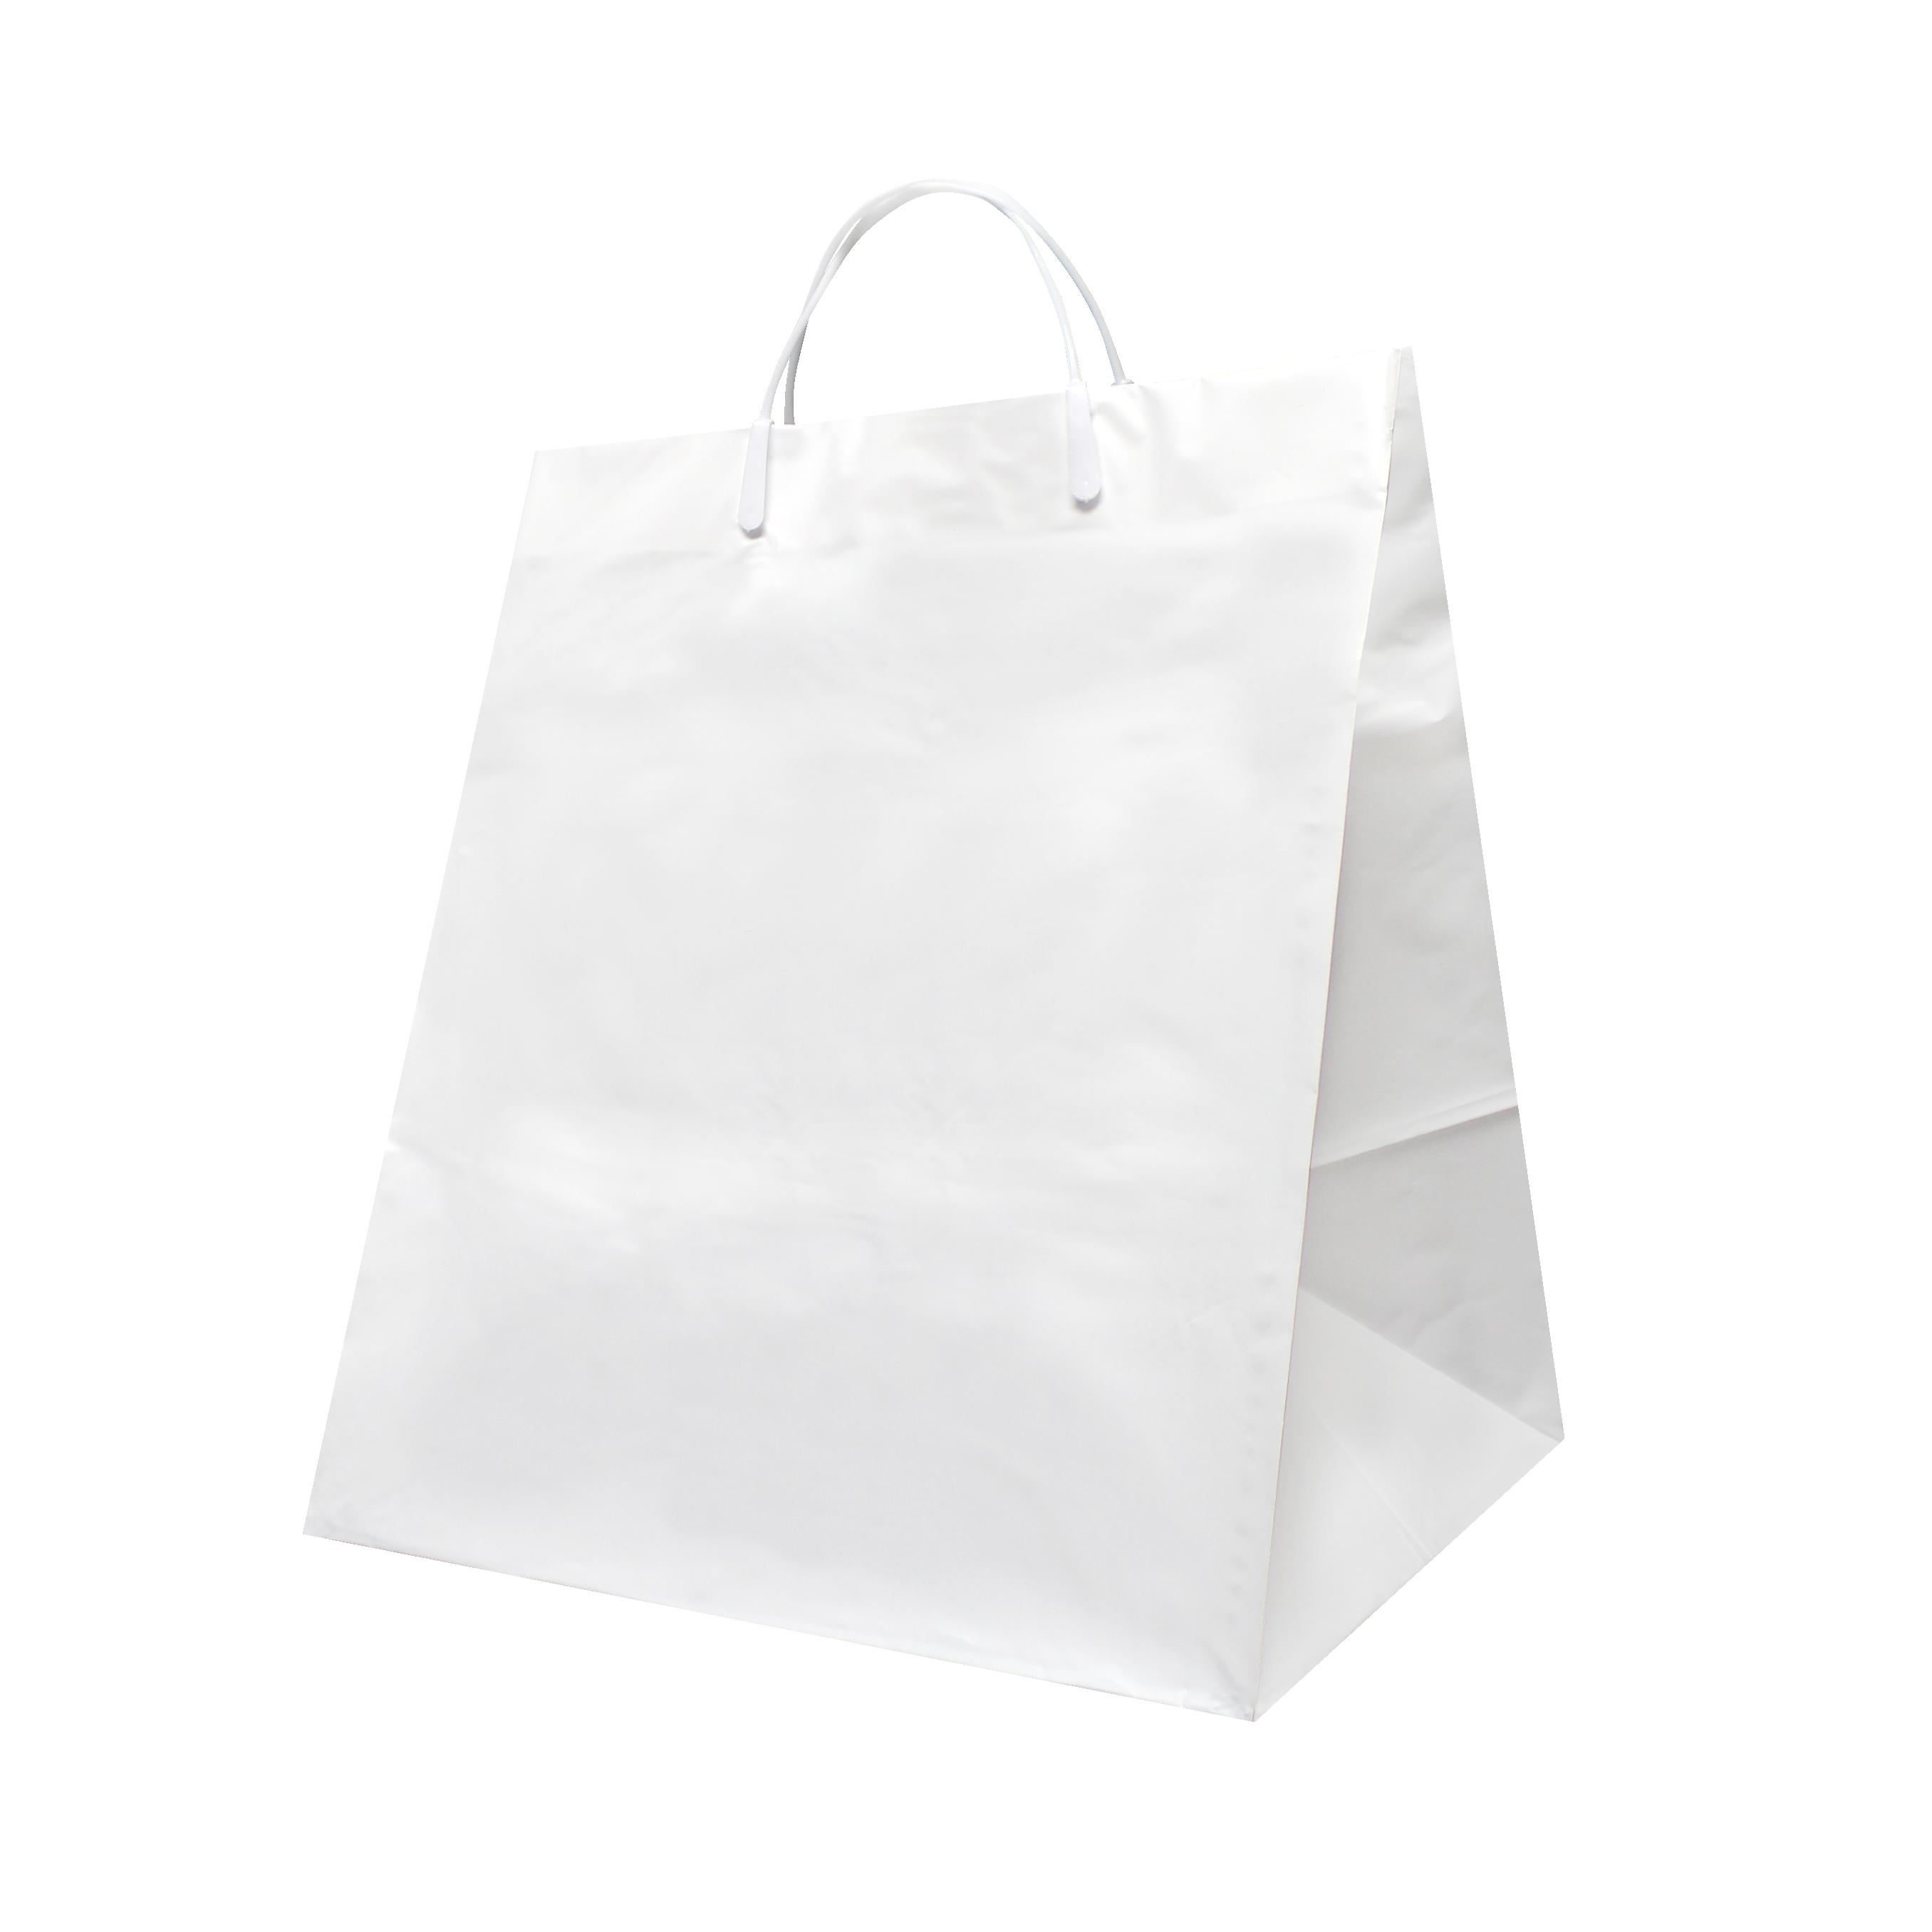 Clip Loop Take Out Bag